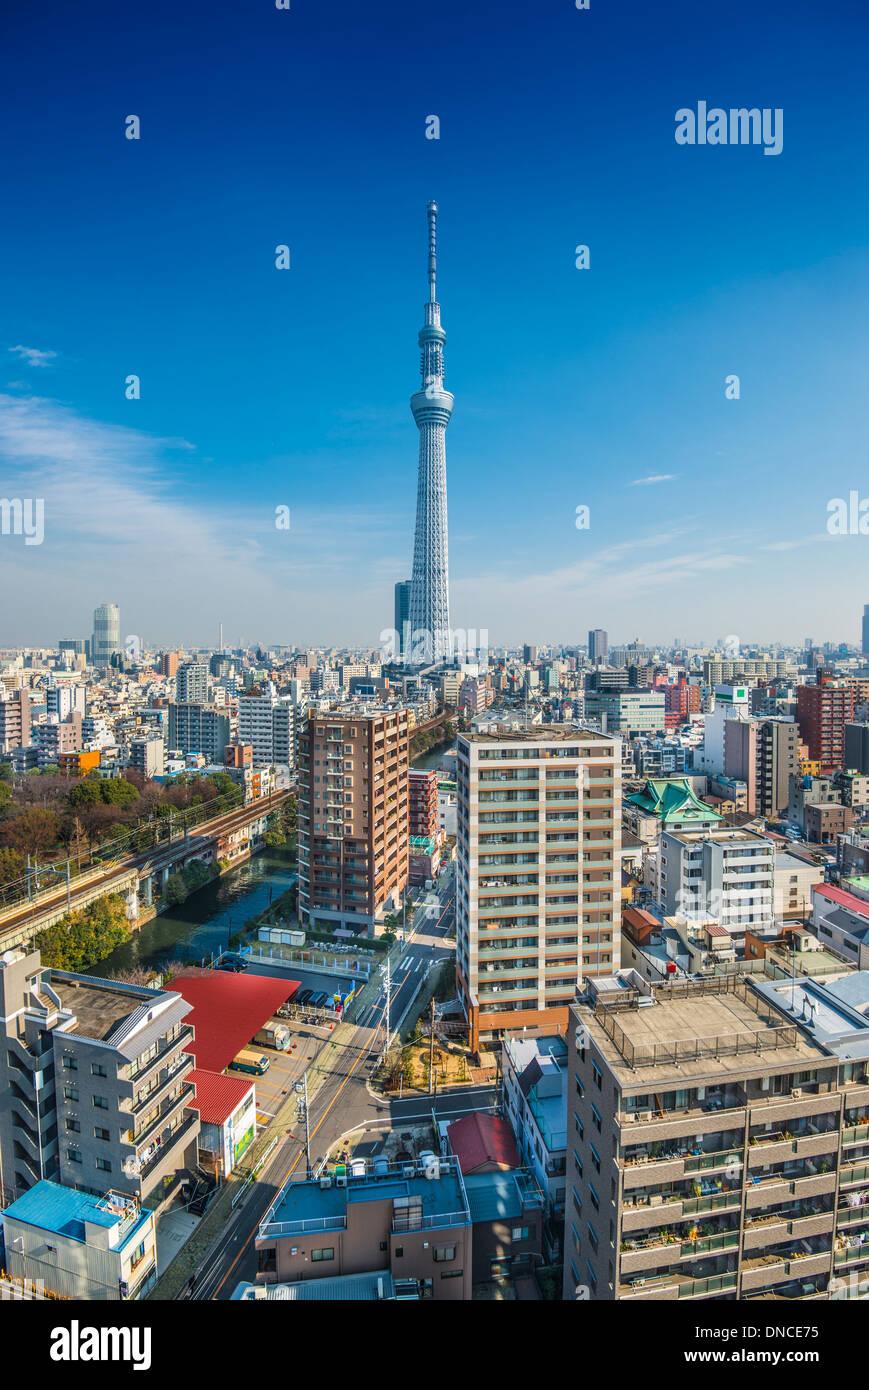 Tokyo, Japan skyline with Tokyo Skytree. - Stock Image